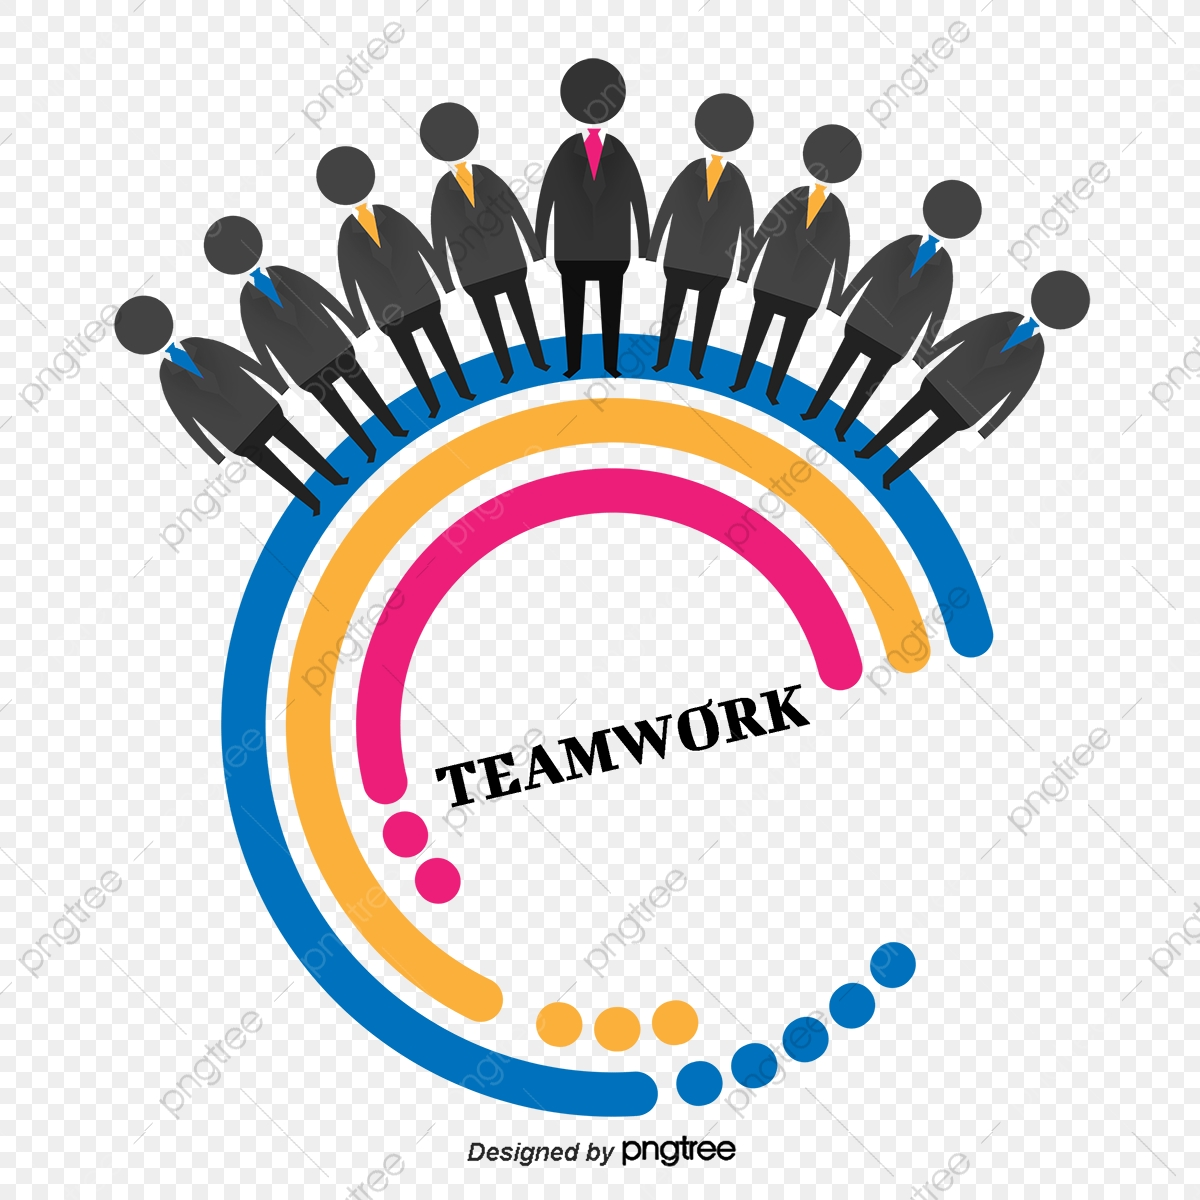 Teamwork Will Succeed, Teamwork Clipart, Team Effort.